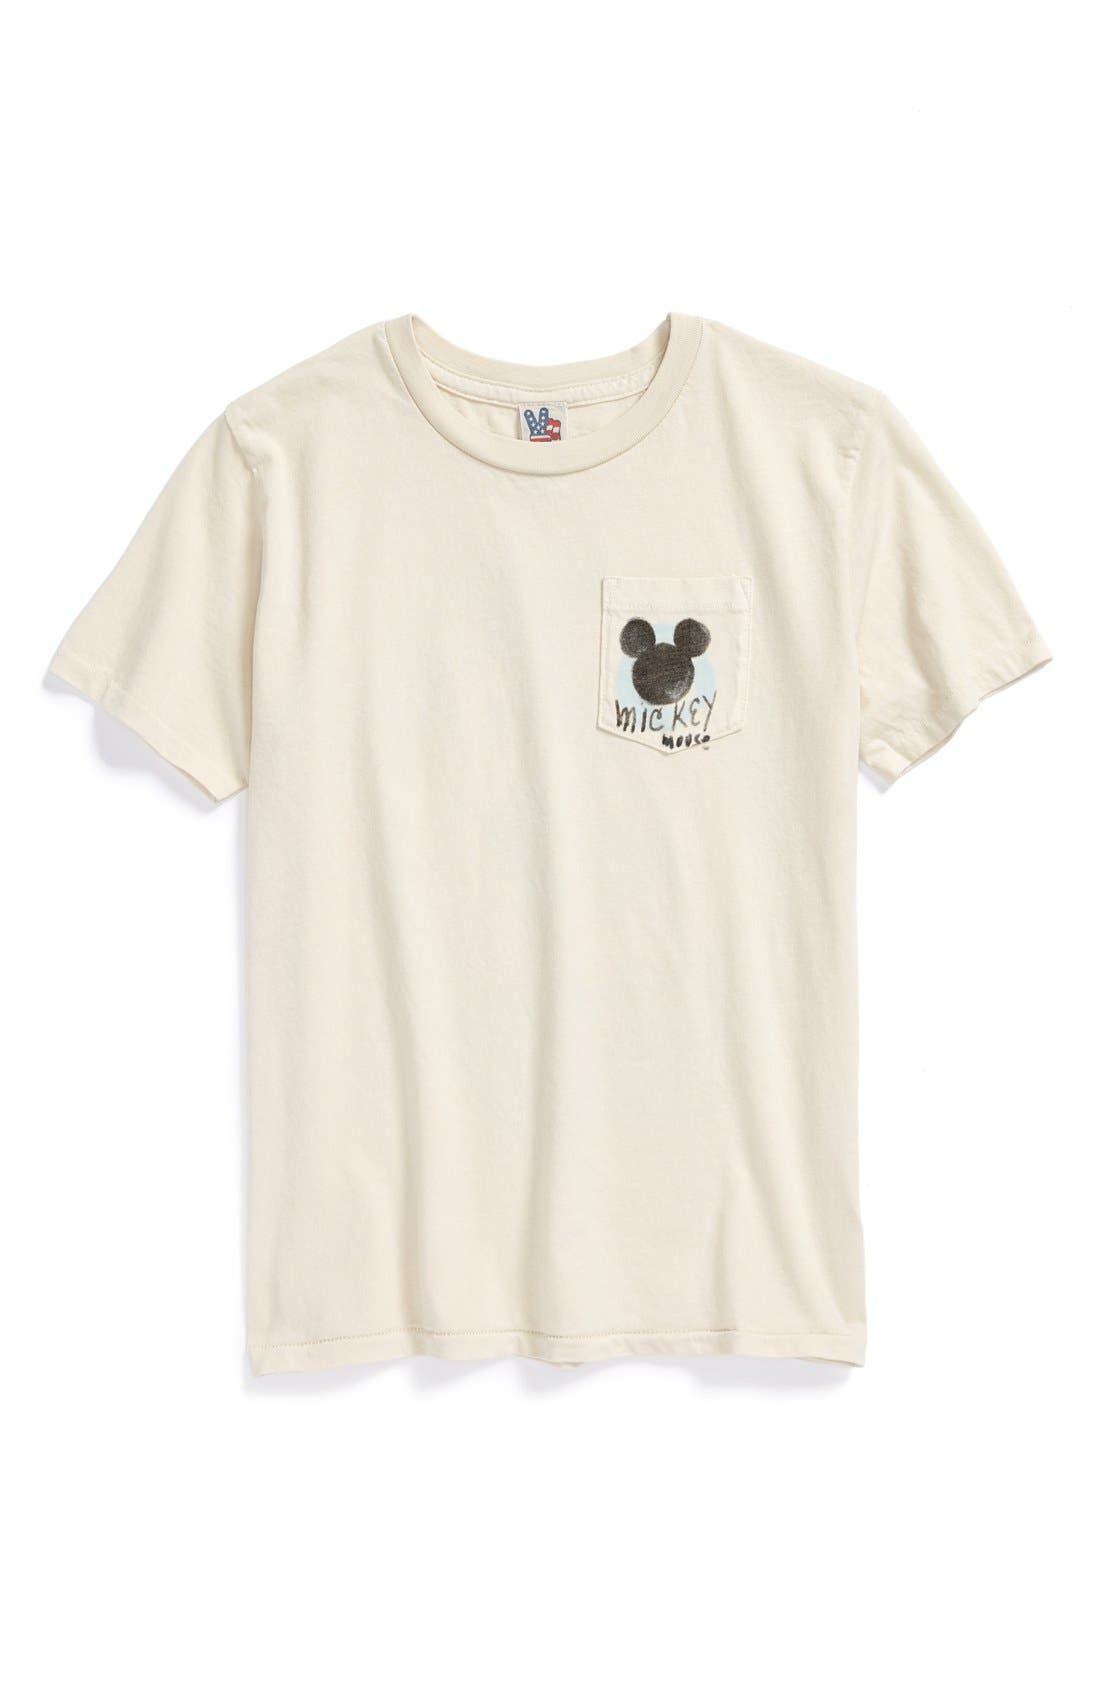 Main Image - Junk Food 'Mickey Mouse™' T-Shirt (Toddler Boys)